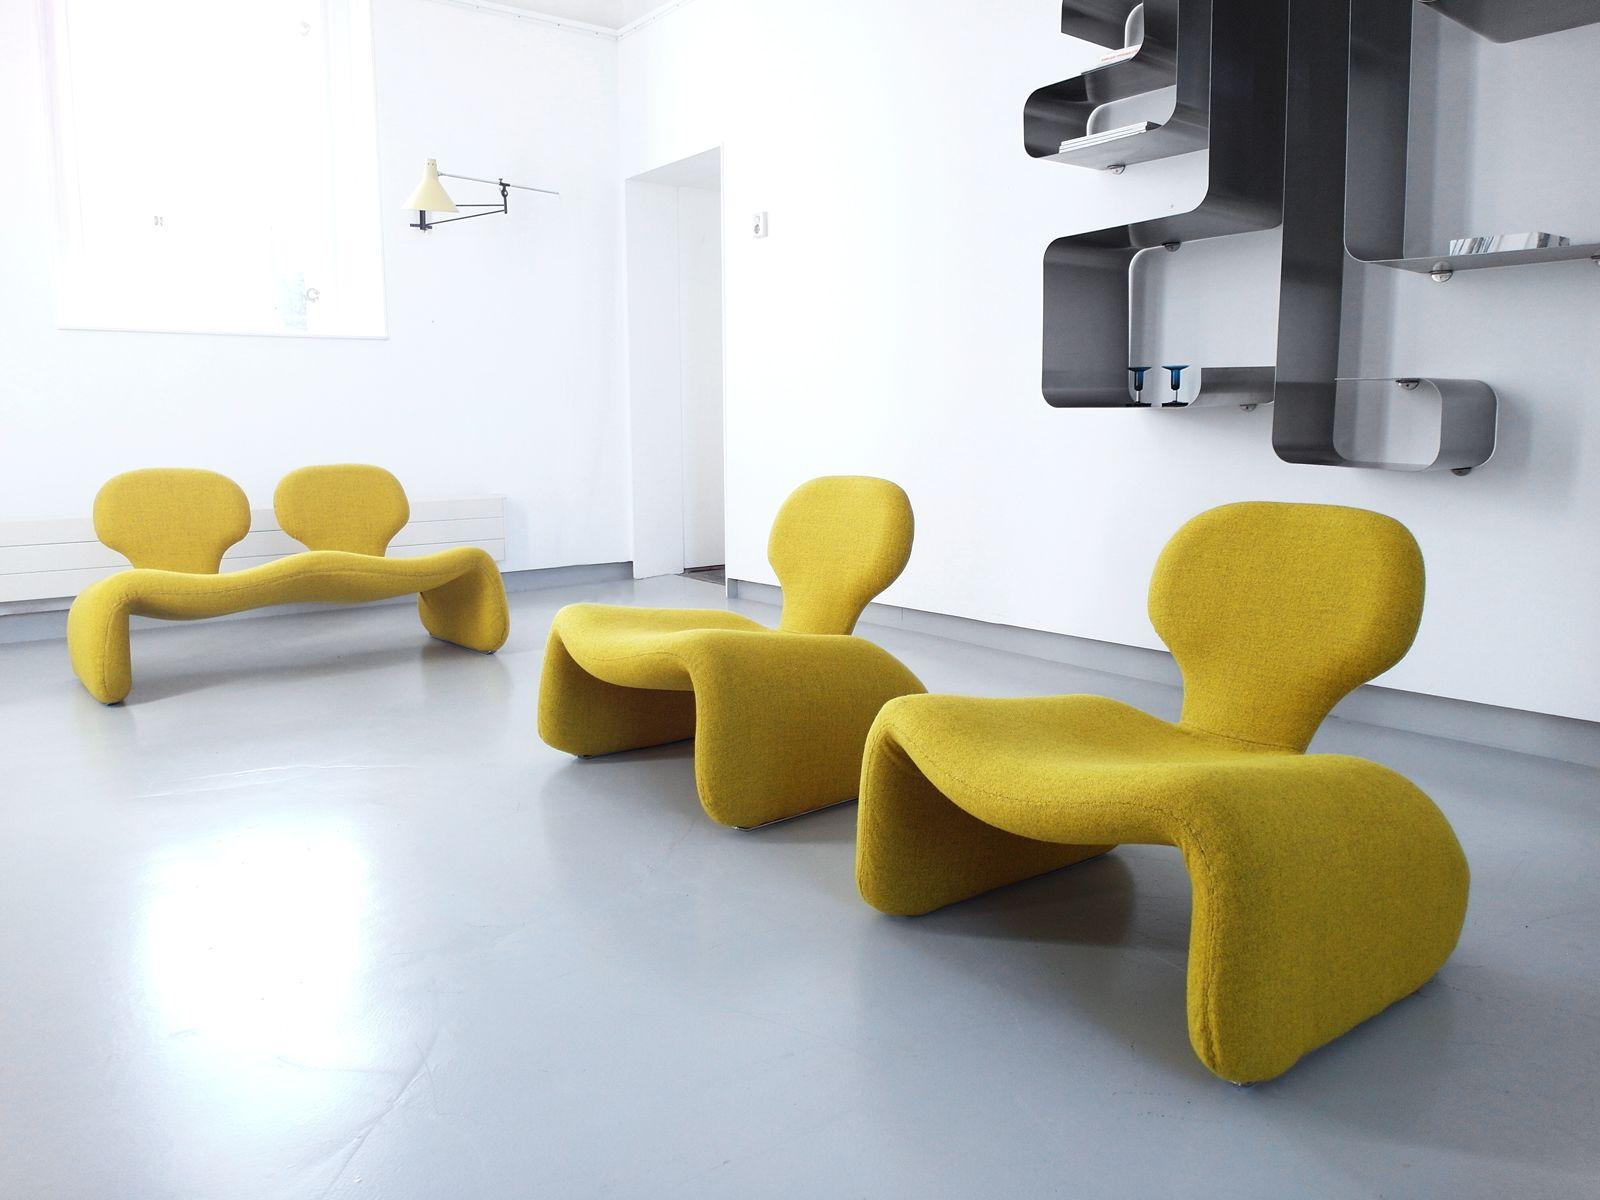 gelbe mid century djinn st hle von olivier mourgue f r. Black Bedroom Furniture Sets. Home Design Ideas